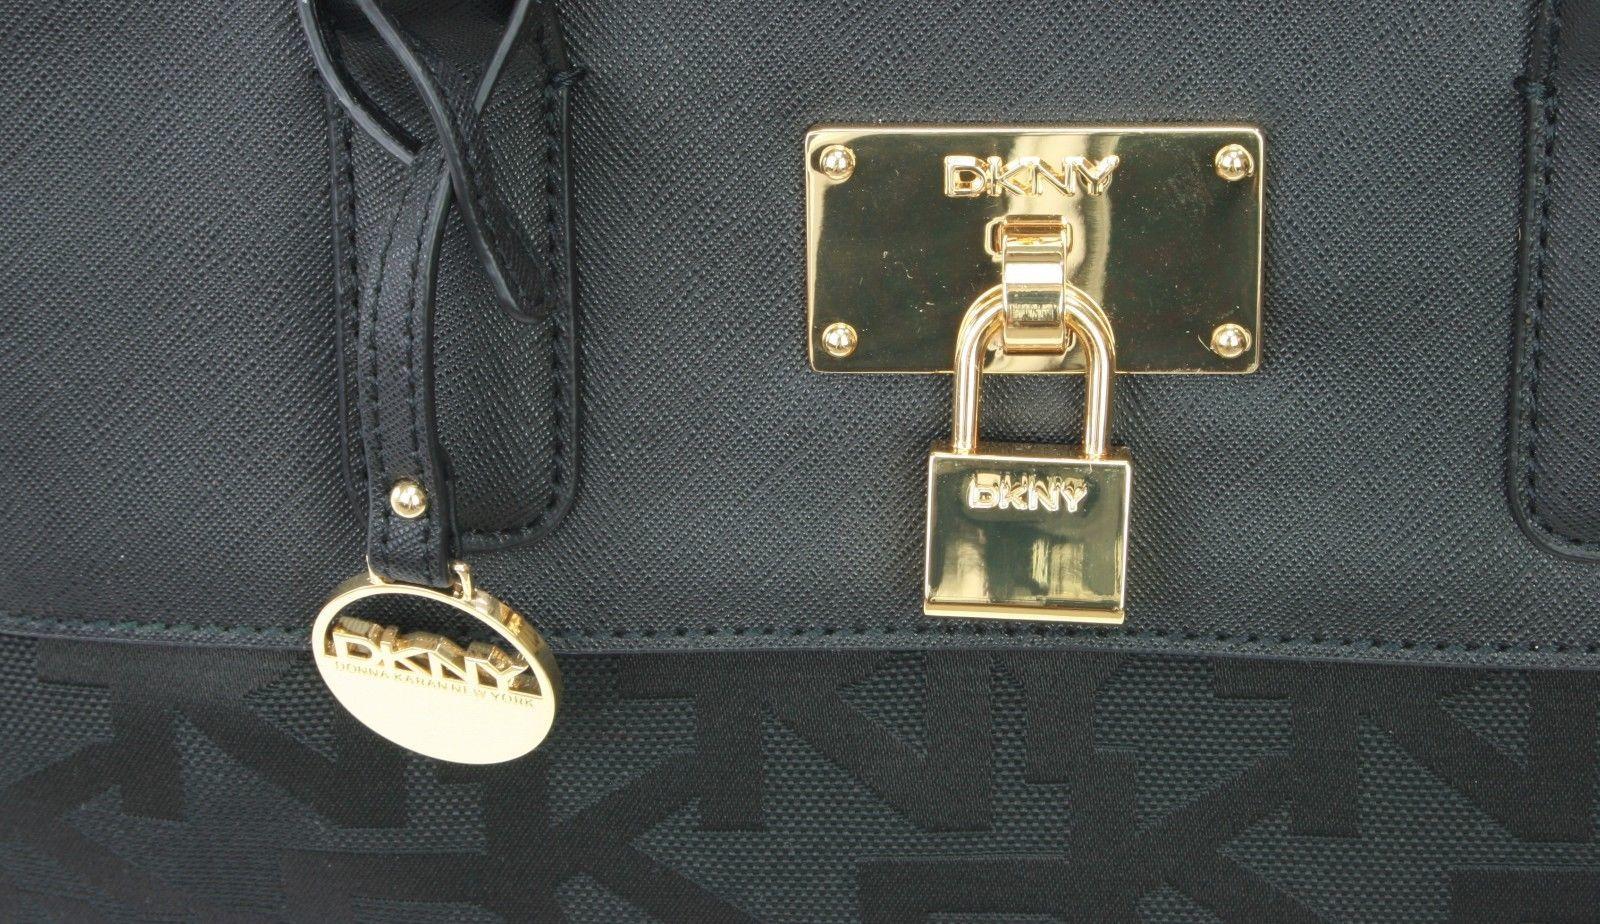 DKNY Donna Karan Black Leather PVC Heritage Tote Cross Body Bag Handbag